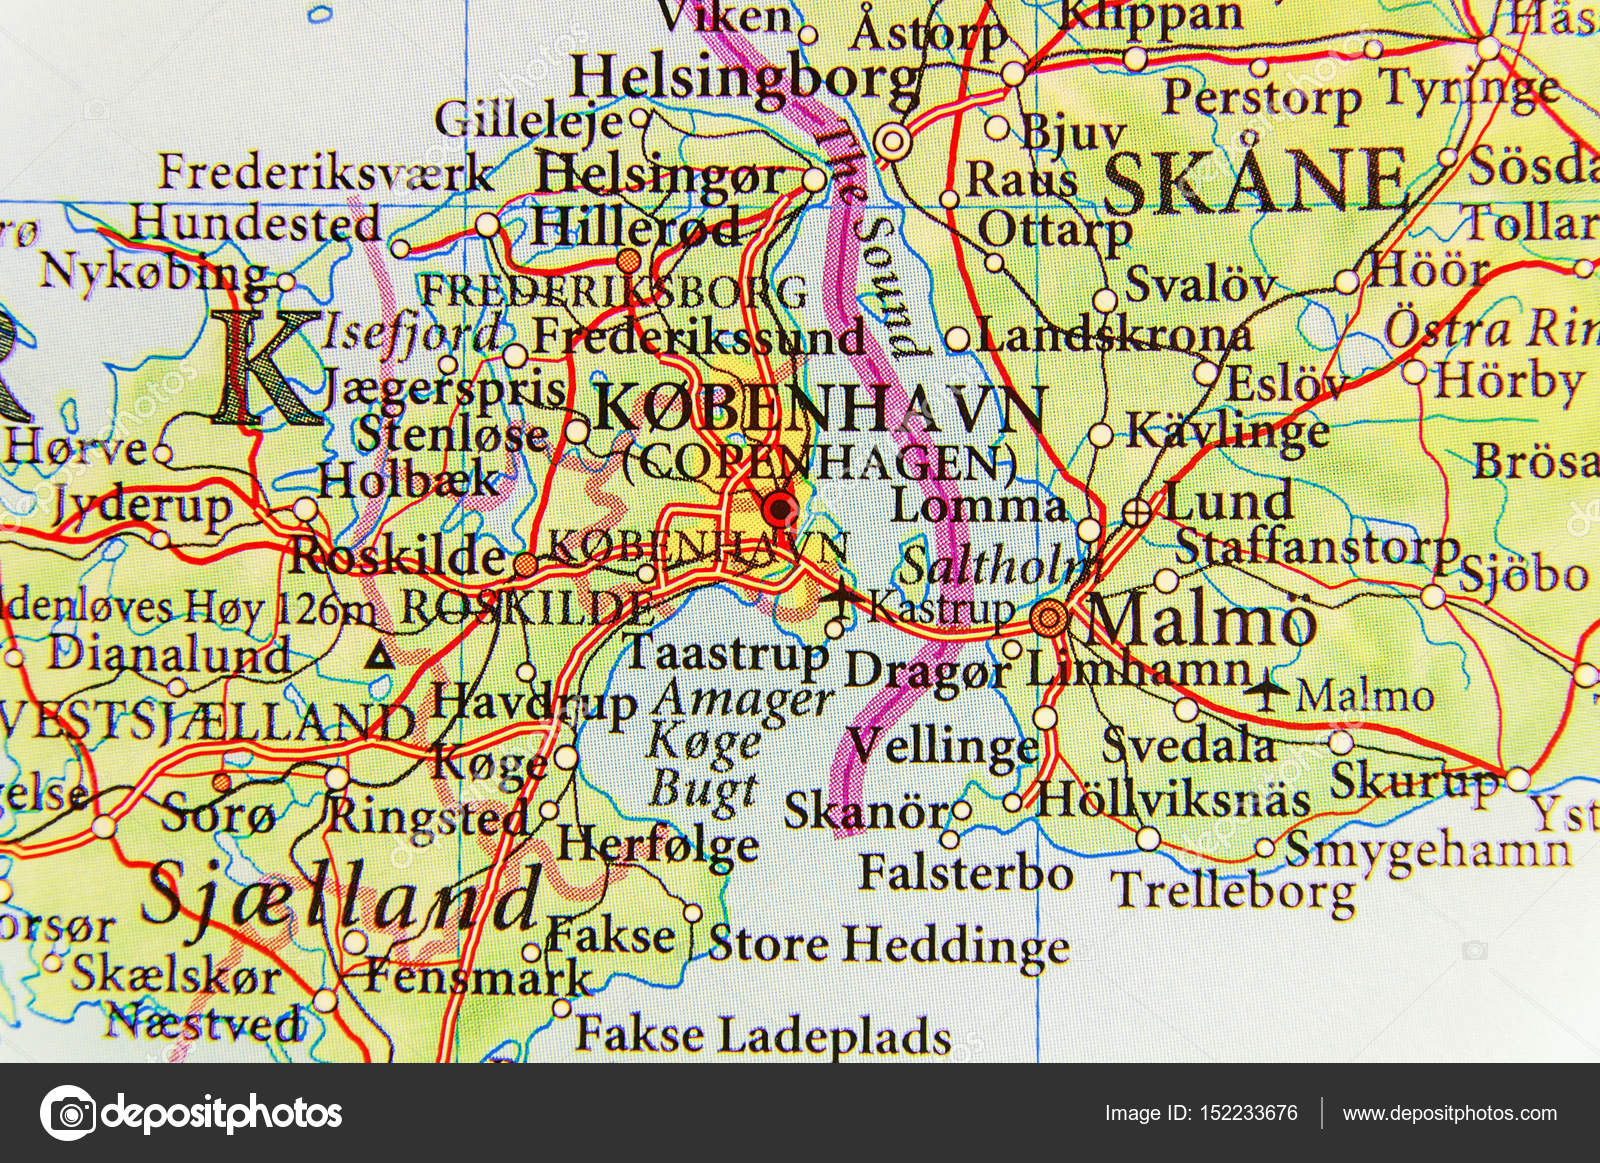 Karta Skane Och Danmark.Geografiska Karta Over Europeiskt Land Danmark Med Huvudstaden Cop